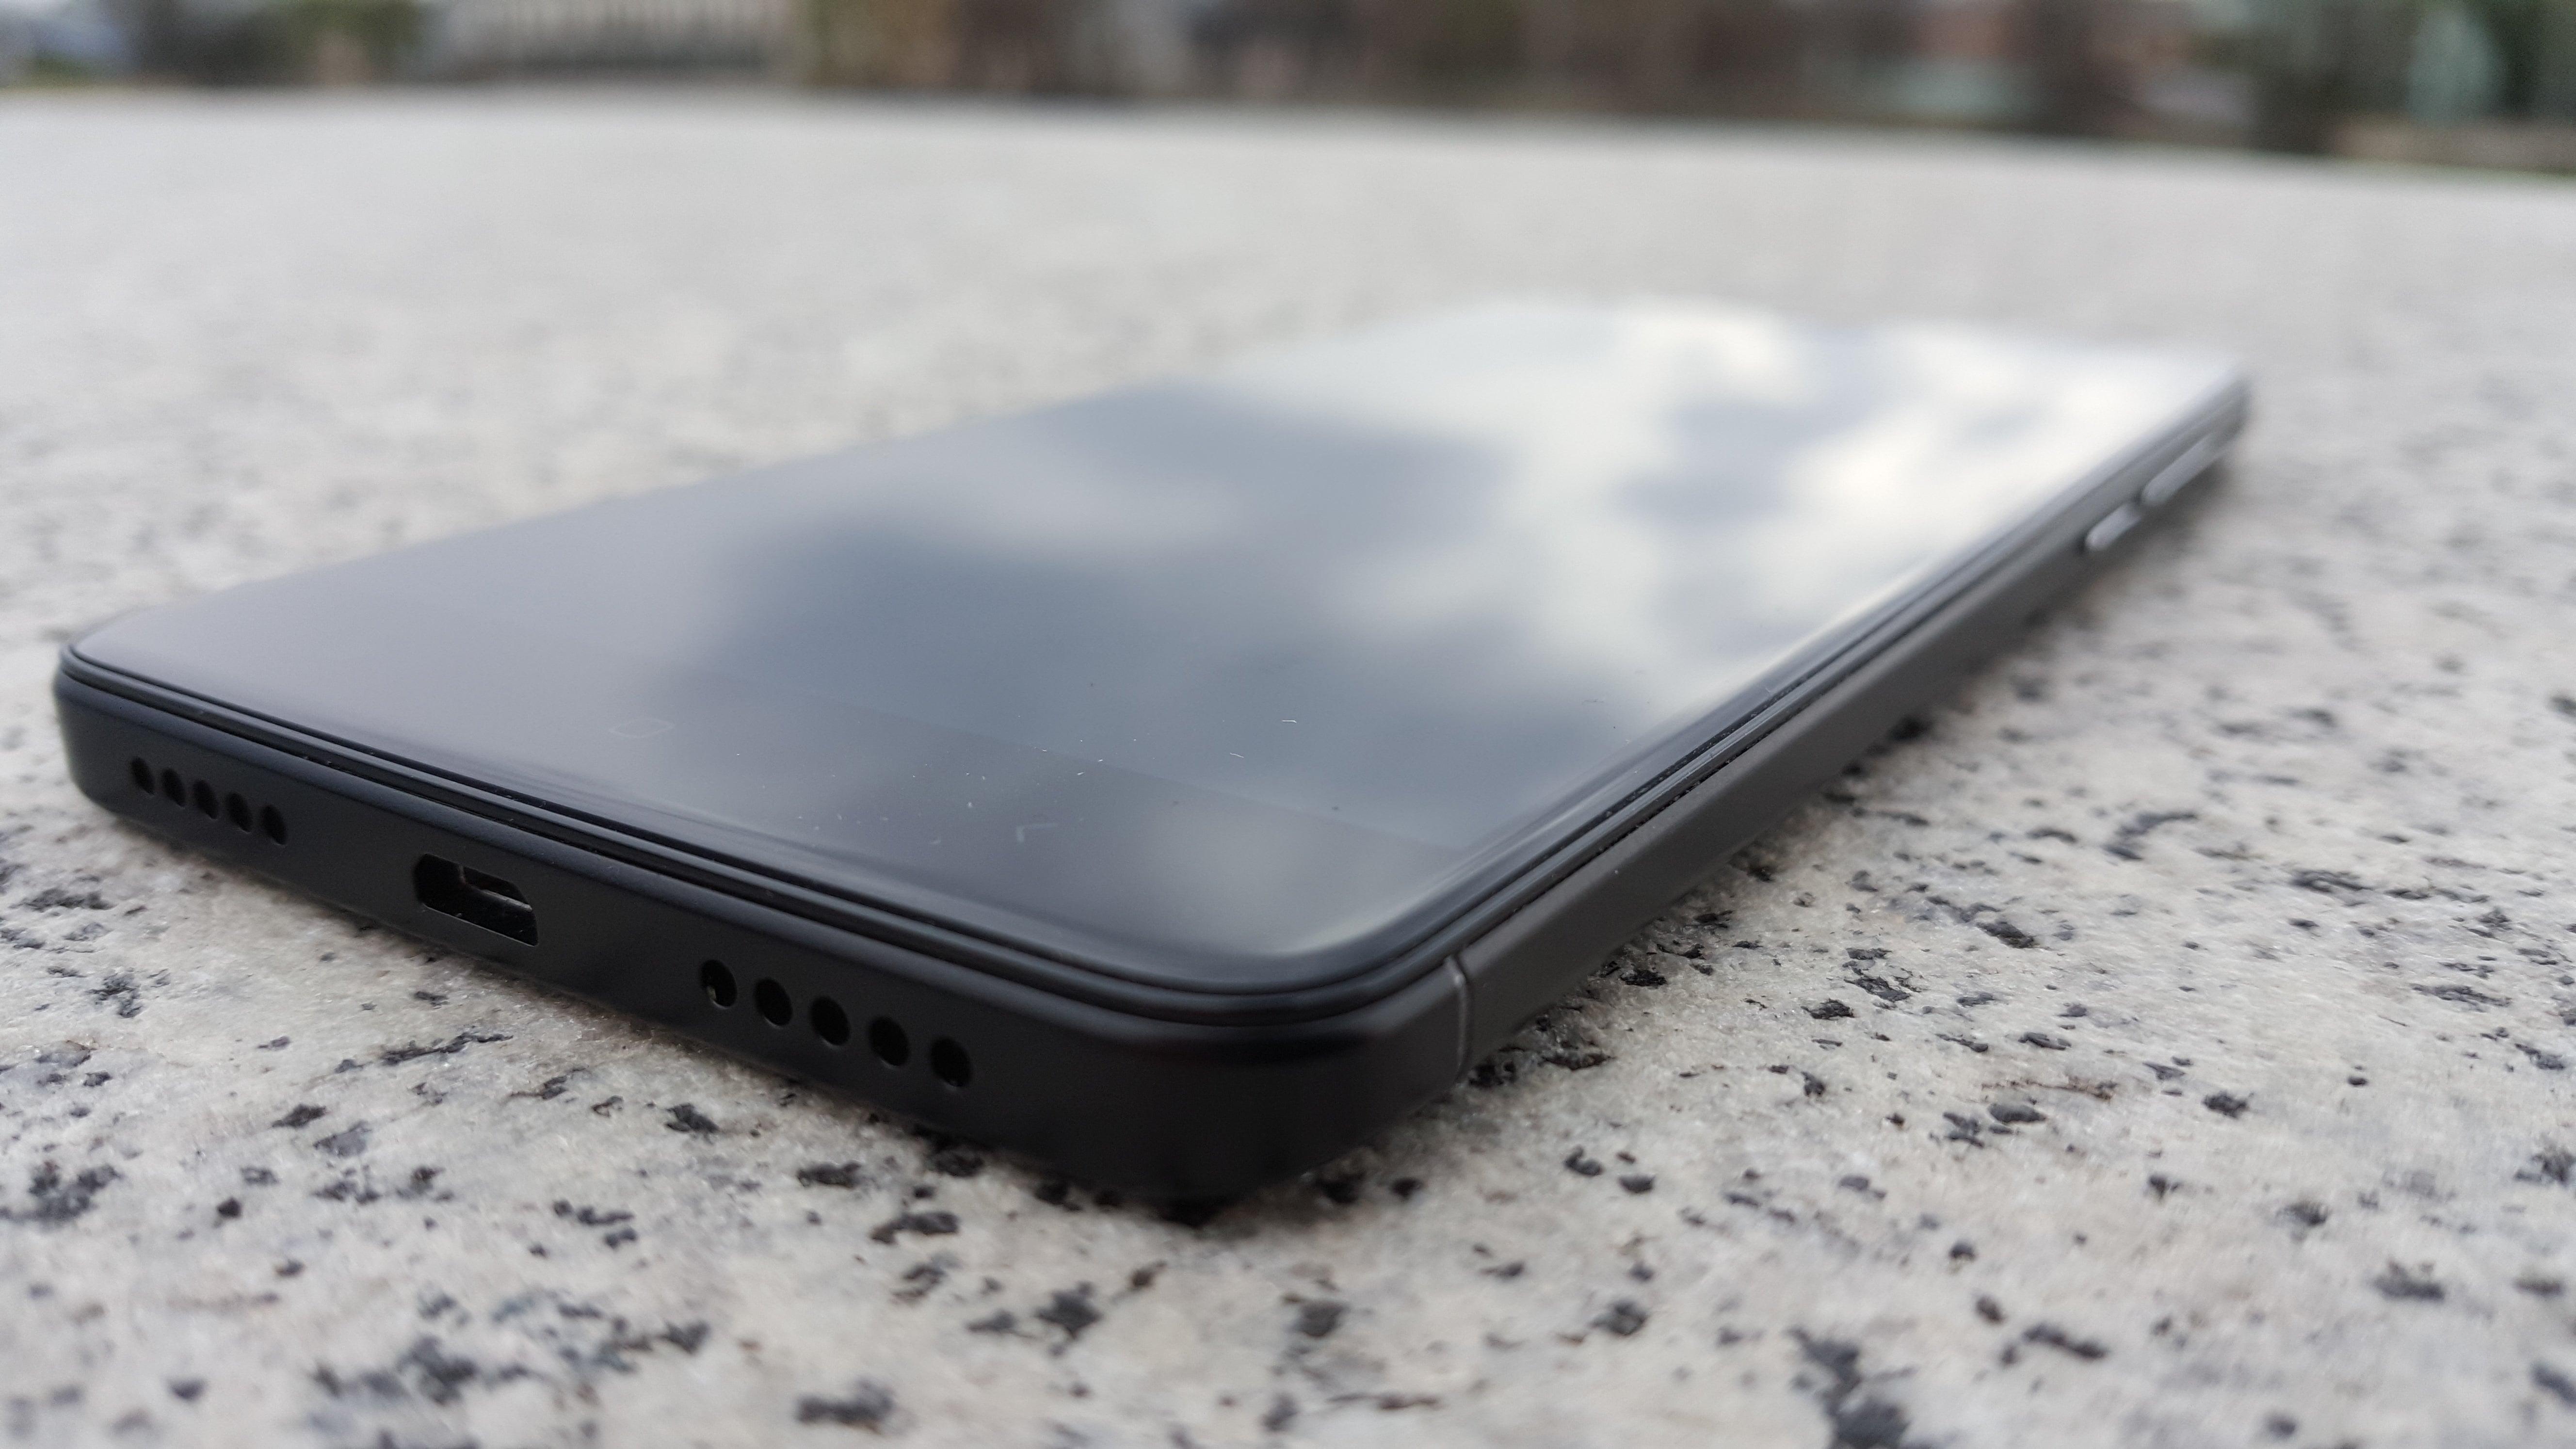 Quick Facts About Xiaomi Redmi Note 4: Recenzja Xiaomi Redmi Note 4